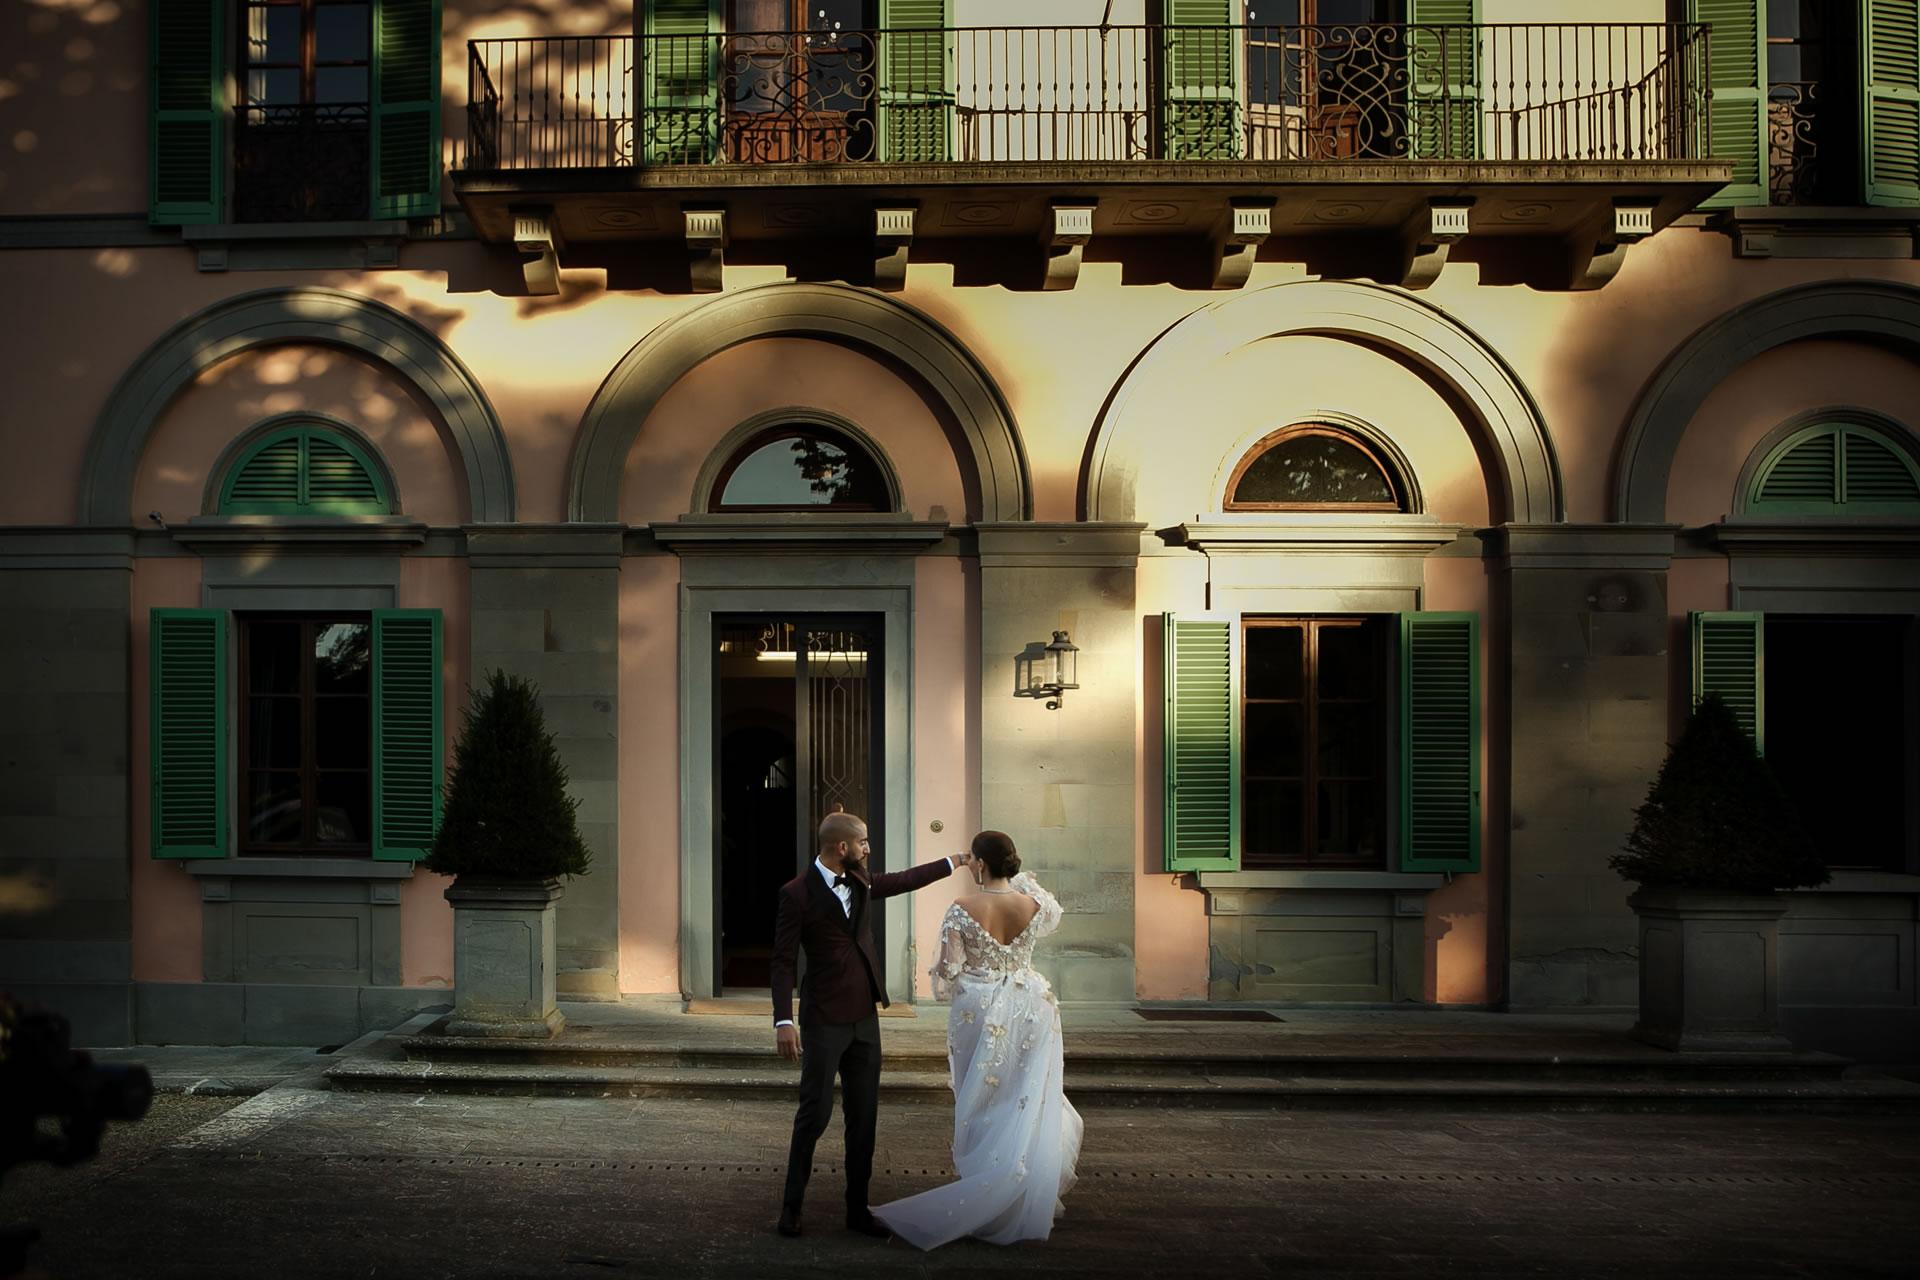 Borro - 16 :: Luxury wedding at Il Borro :: Luxury wedding photography - 15 :: Borro - 16